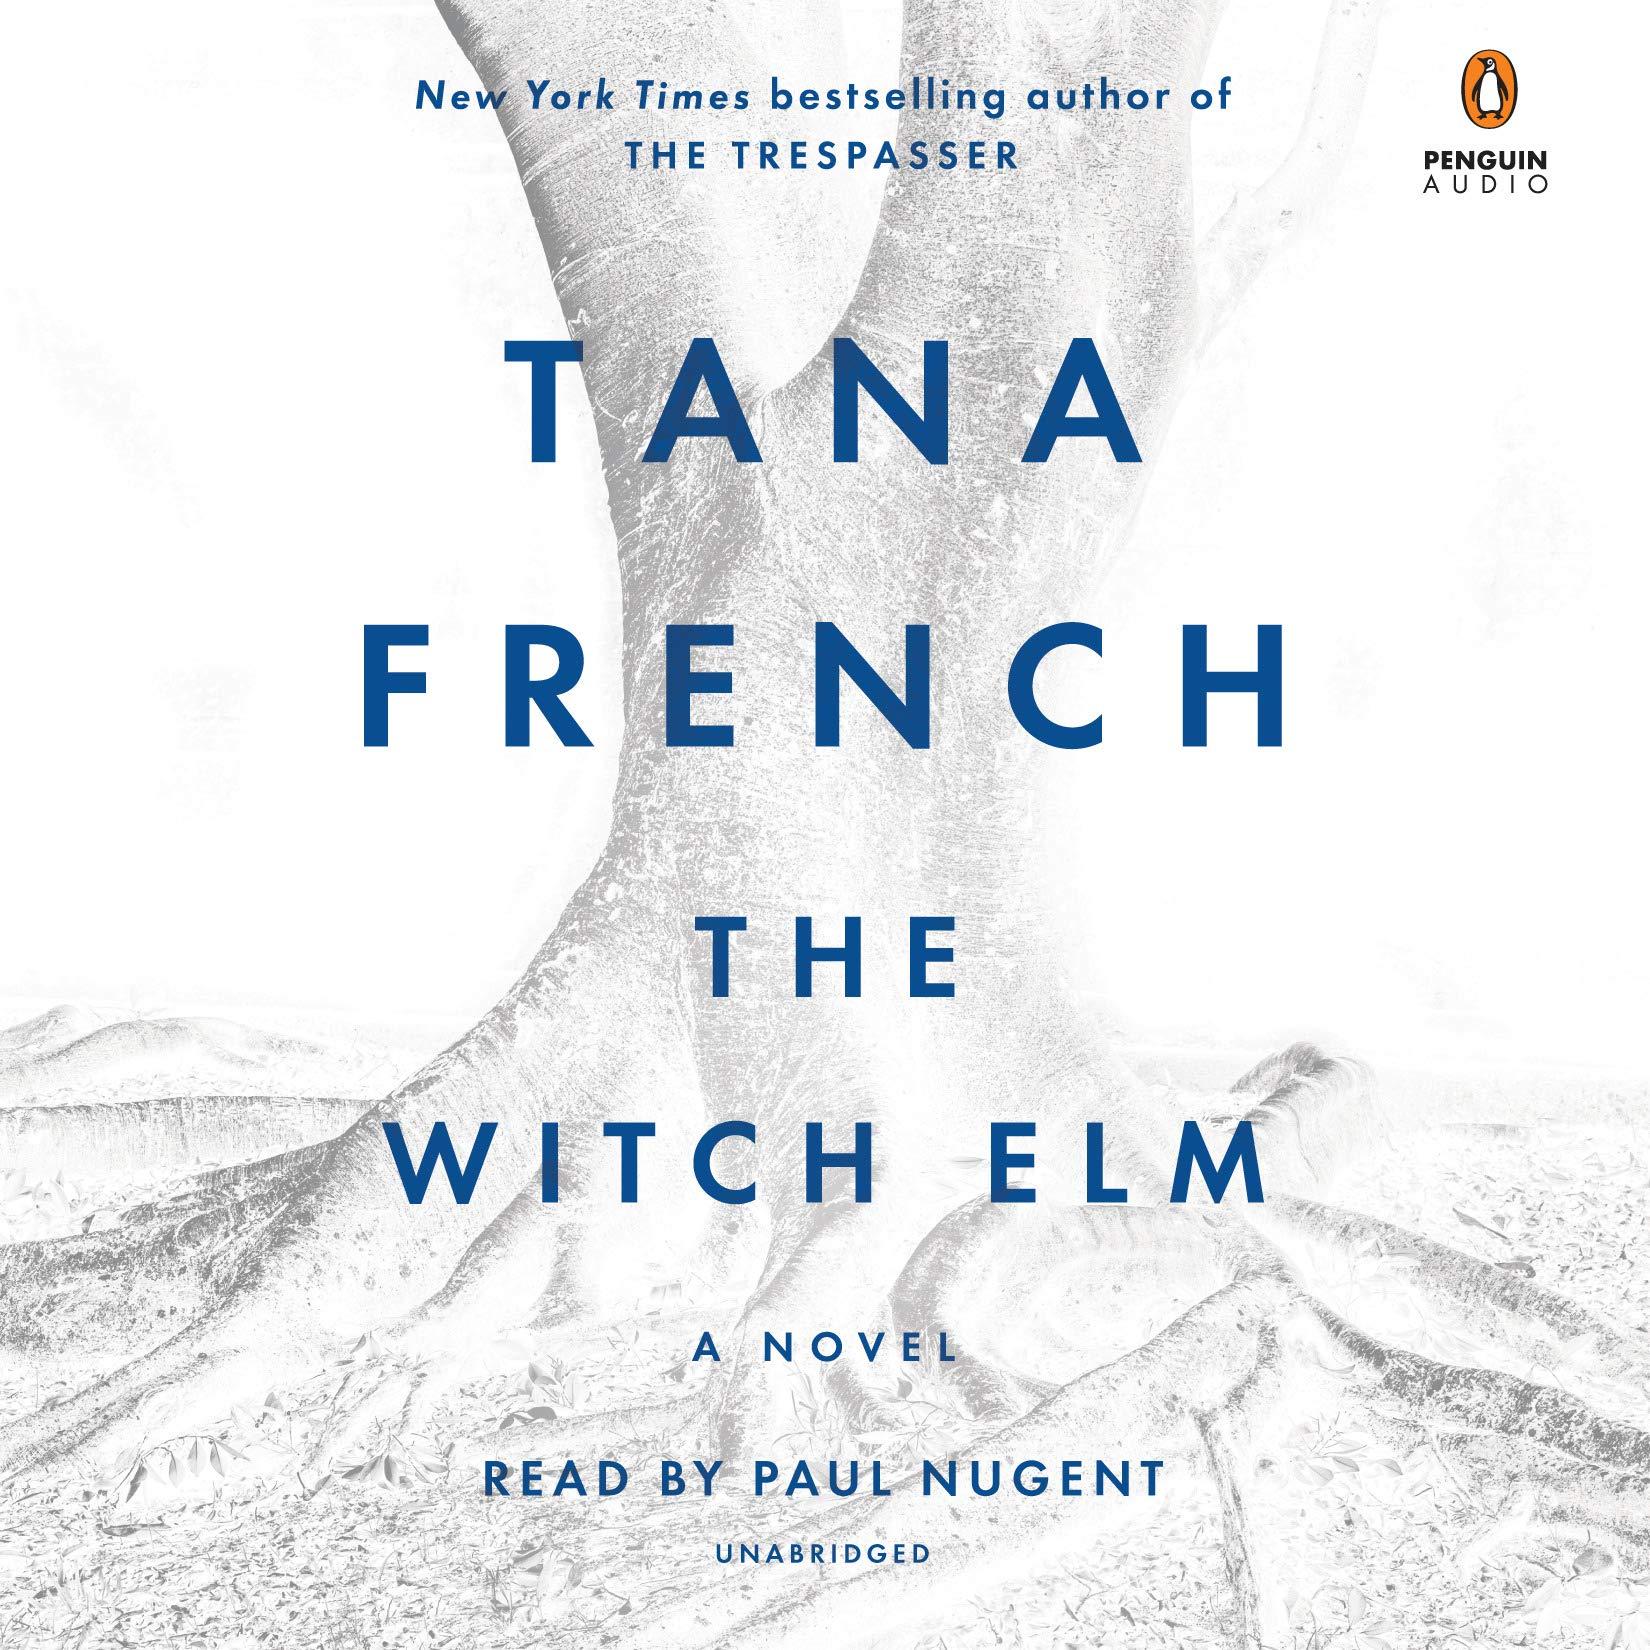 The Witch Elm: Amazon.es: Tana French, Paul Nugent: Libros en idiomas extranjeros